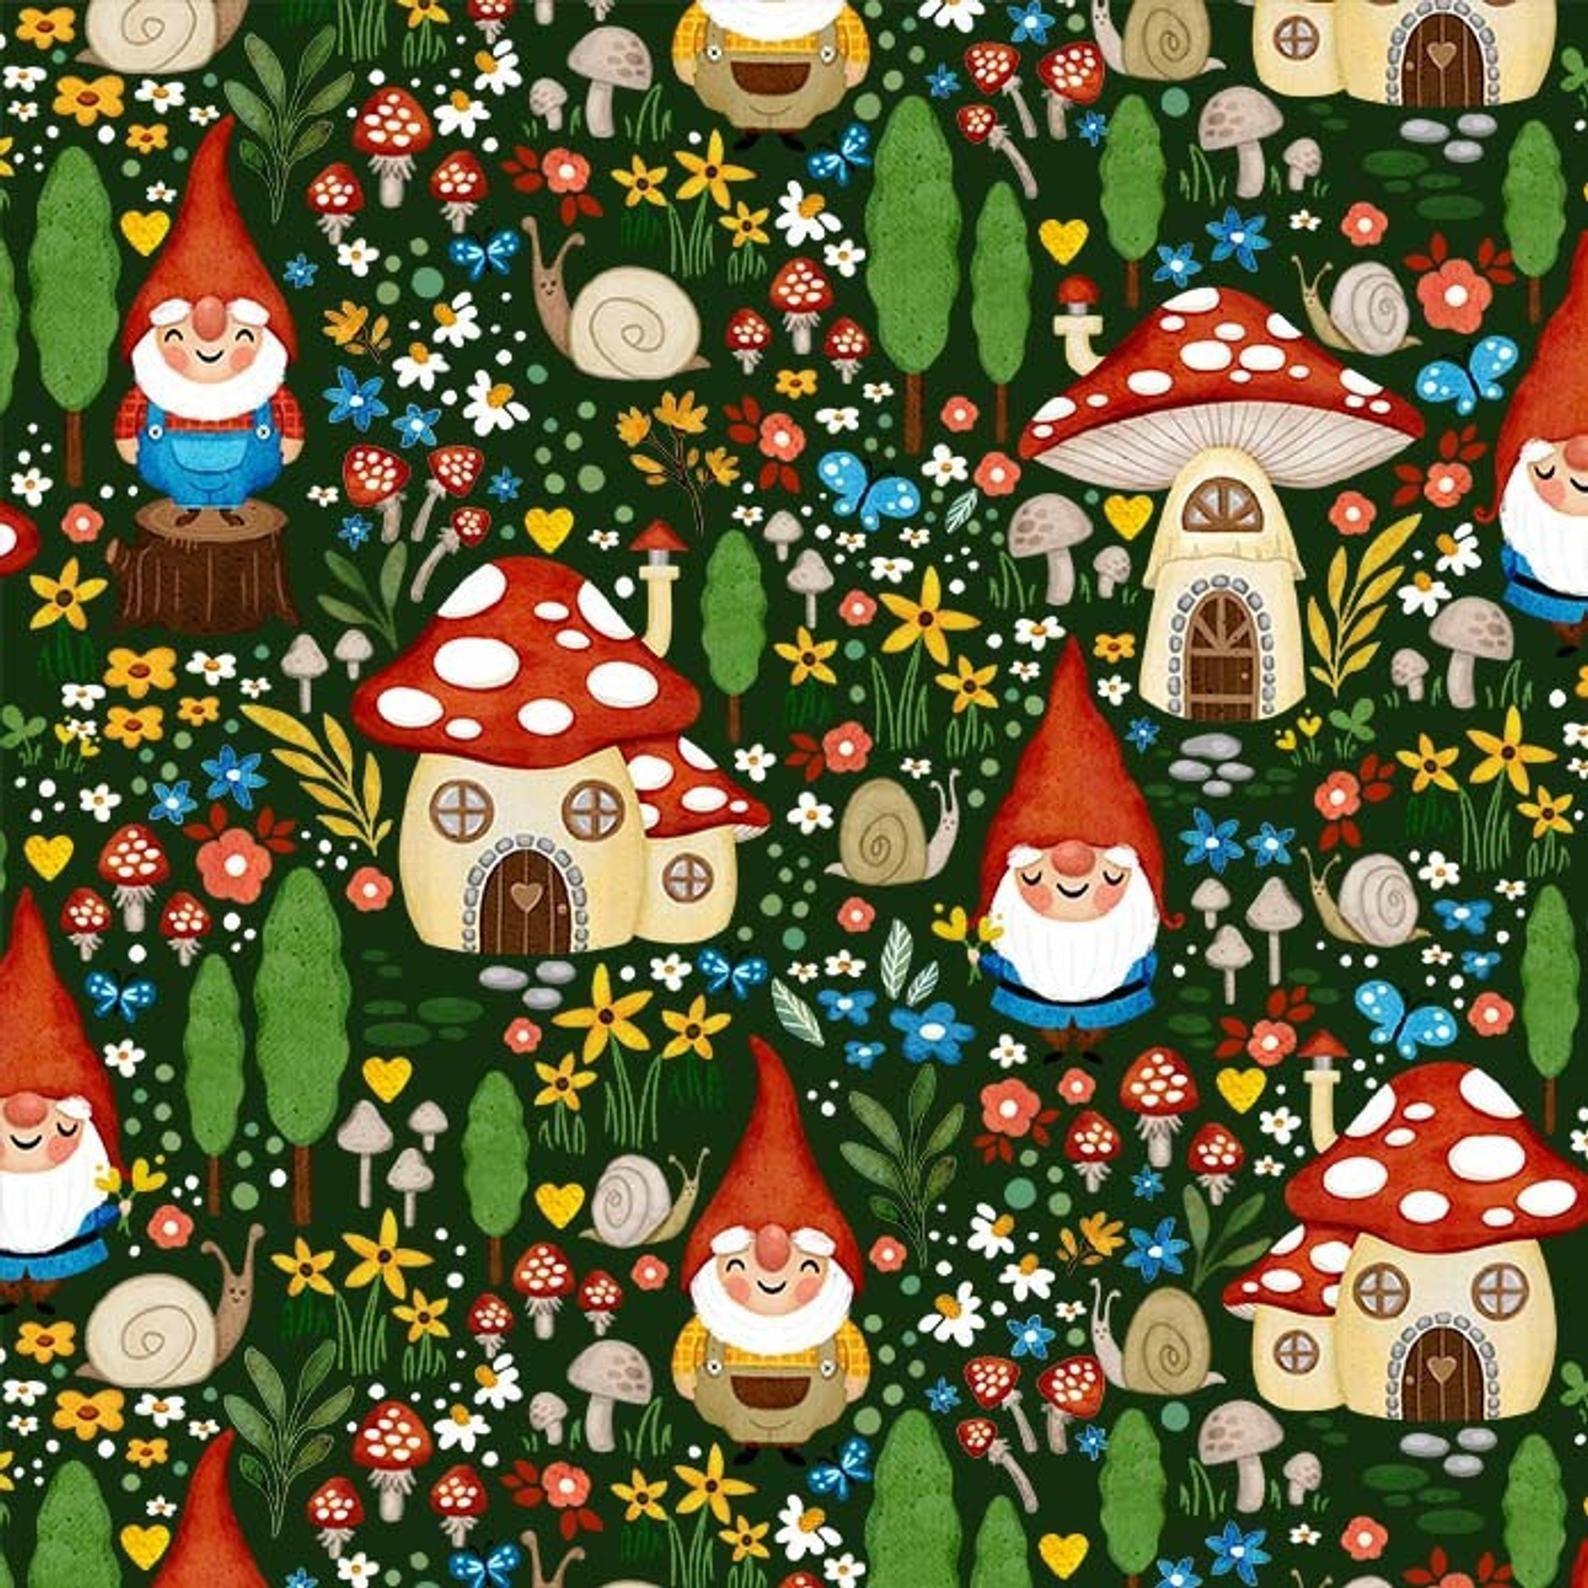 Gnome Sweet Gnome - Gnome Garden